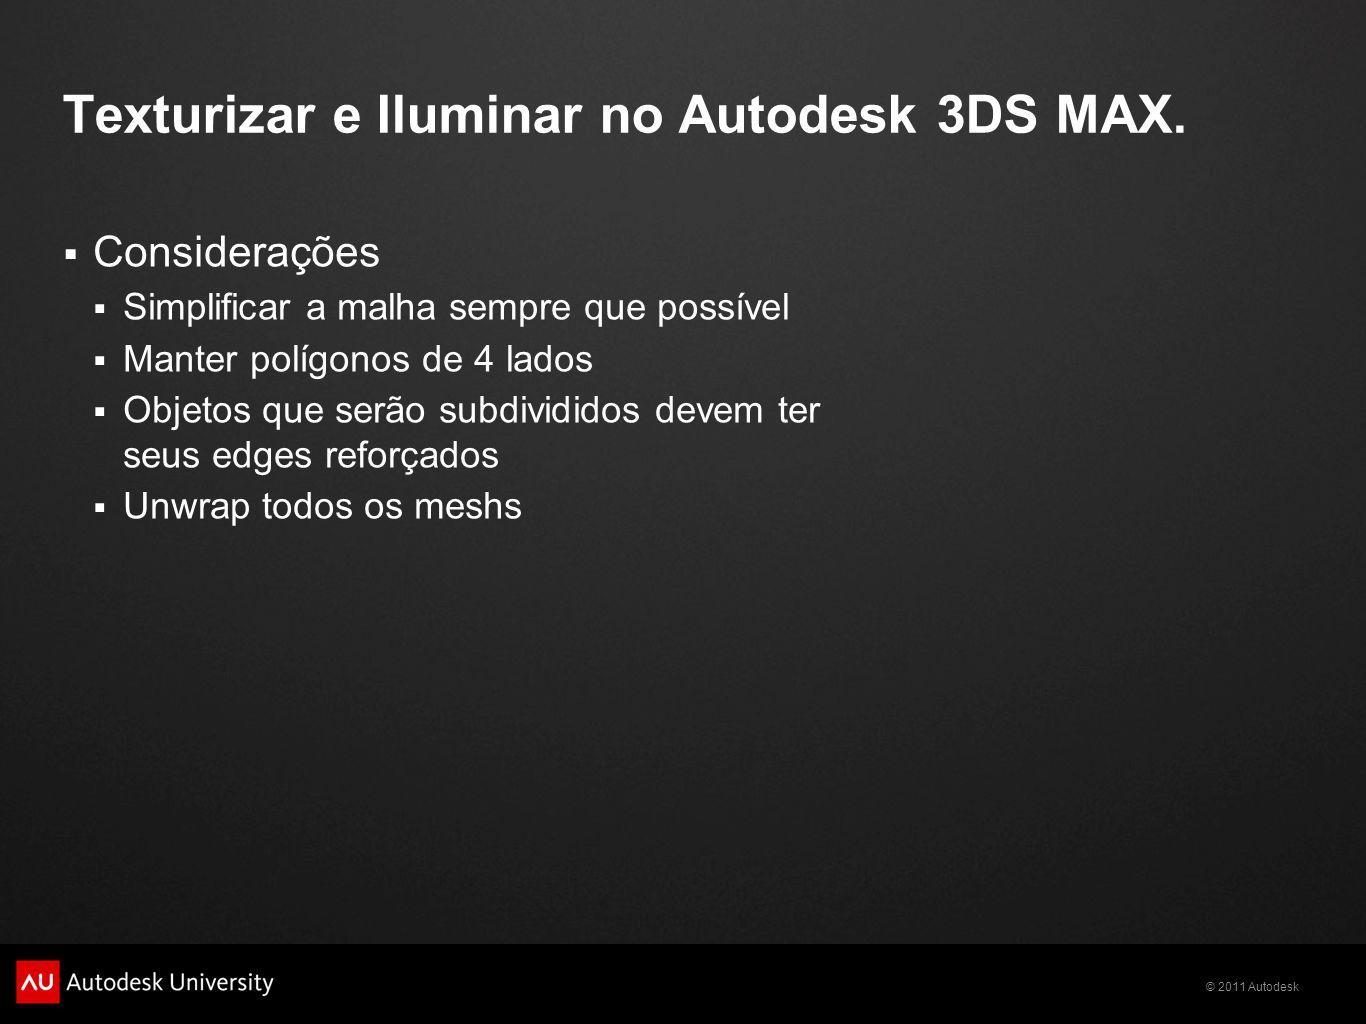 Texturizar e Iluminar no Autodesk 3DS MAX.